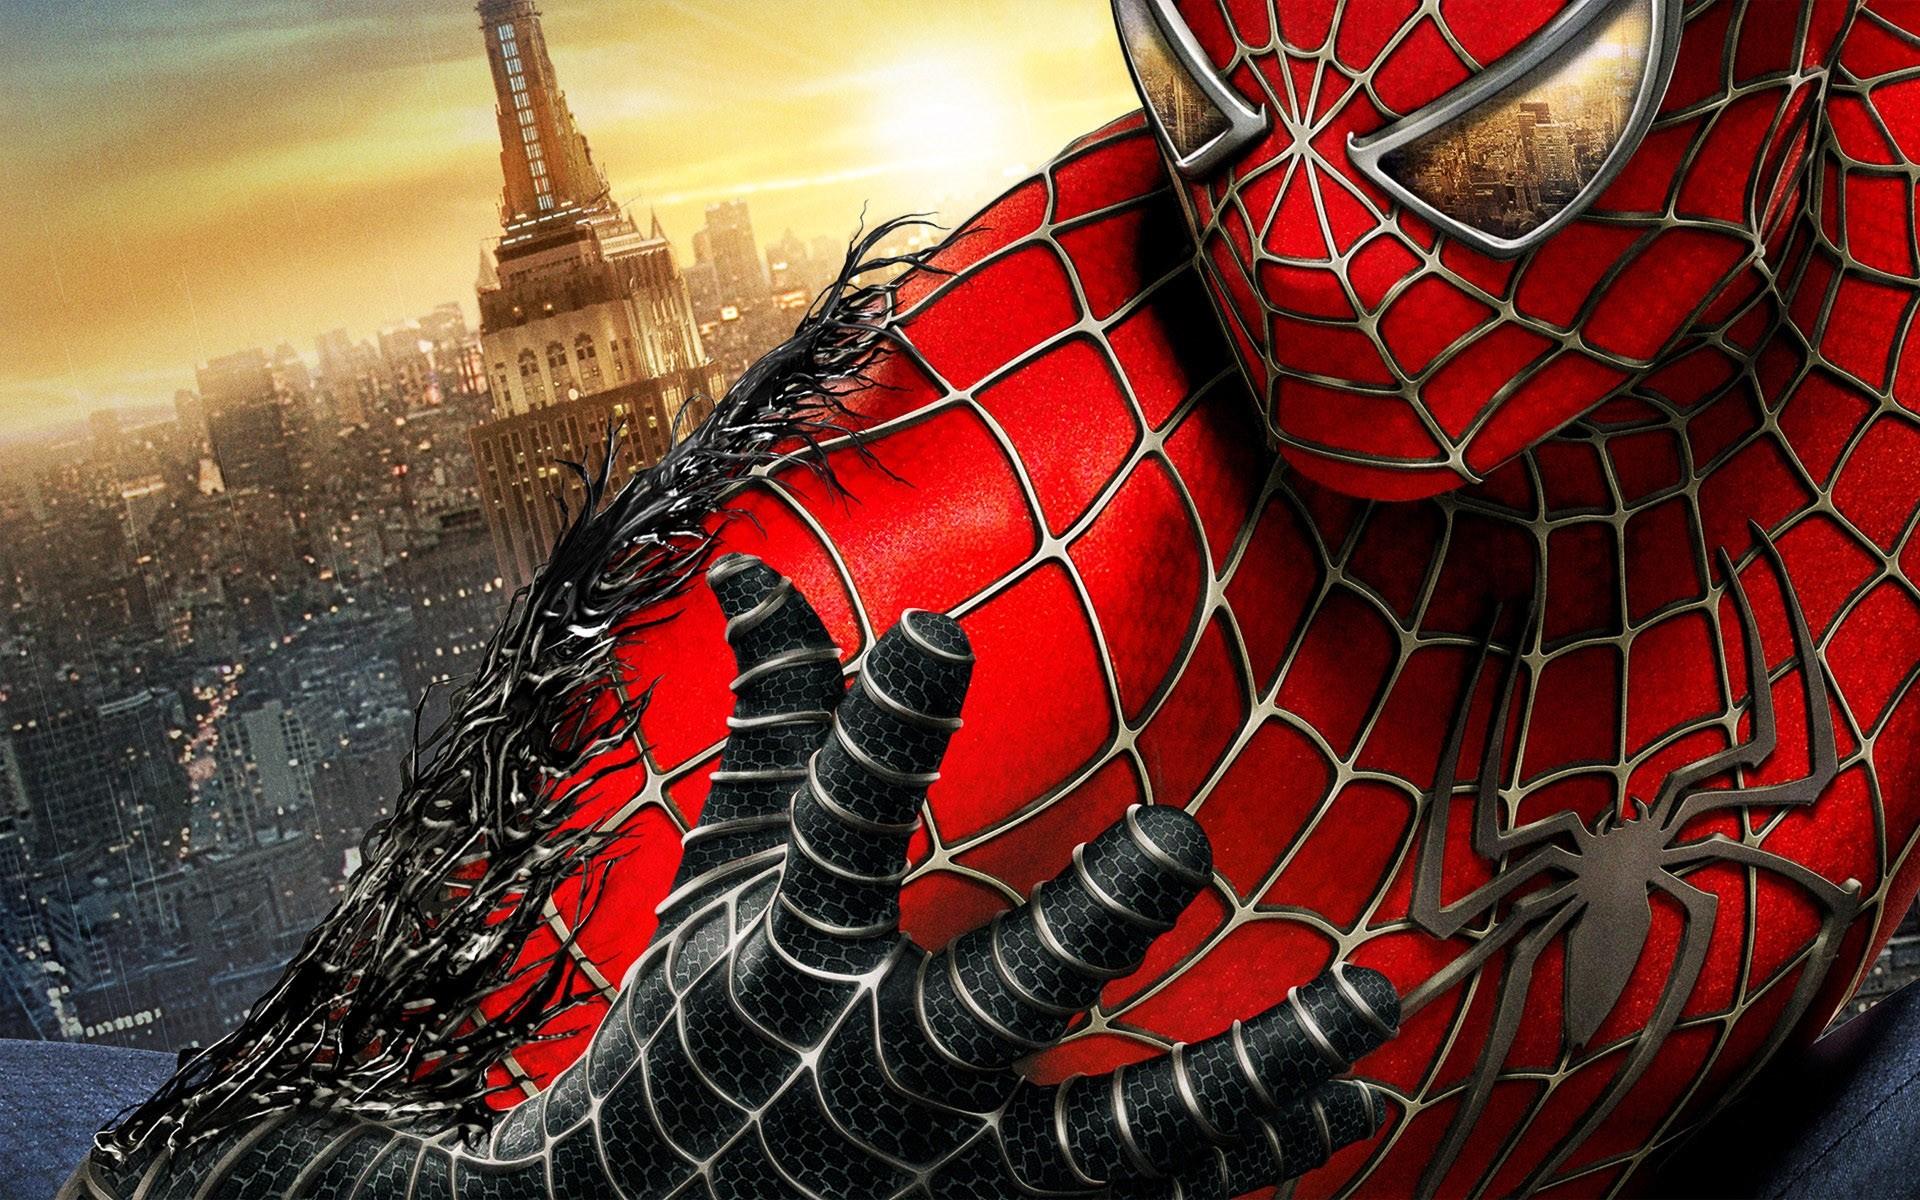 Download Original Size. ,. Spiderman Background Pictures wallpaper hd  1920×1200